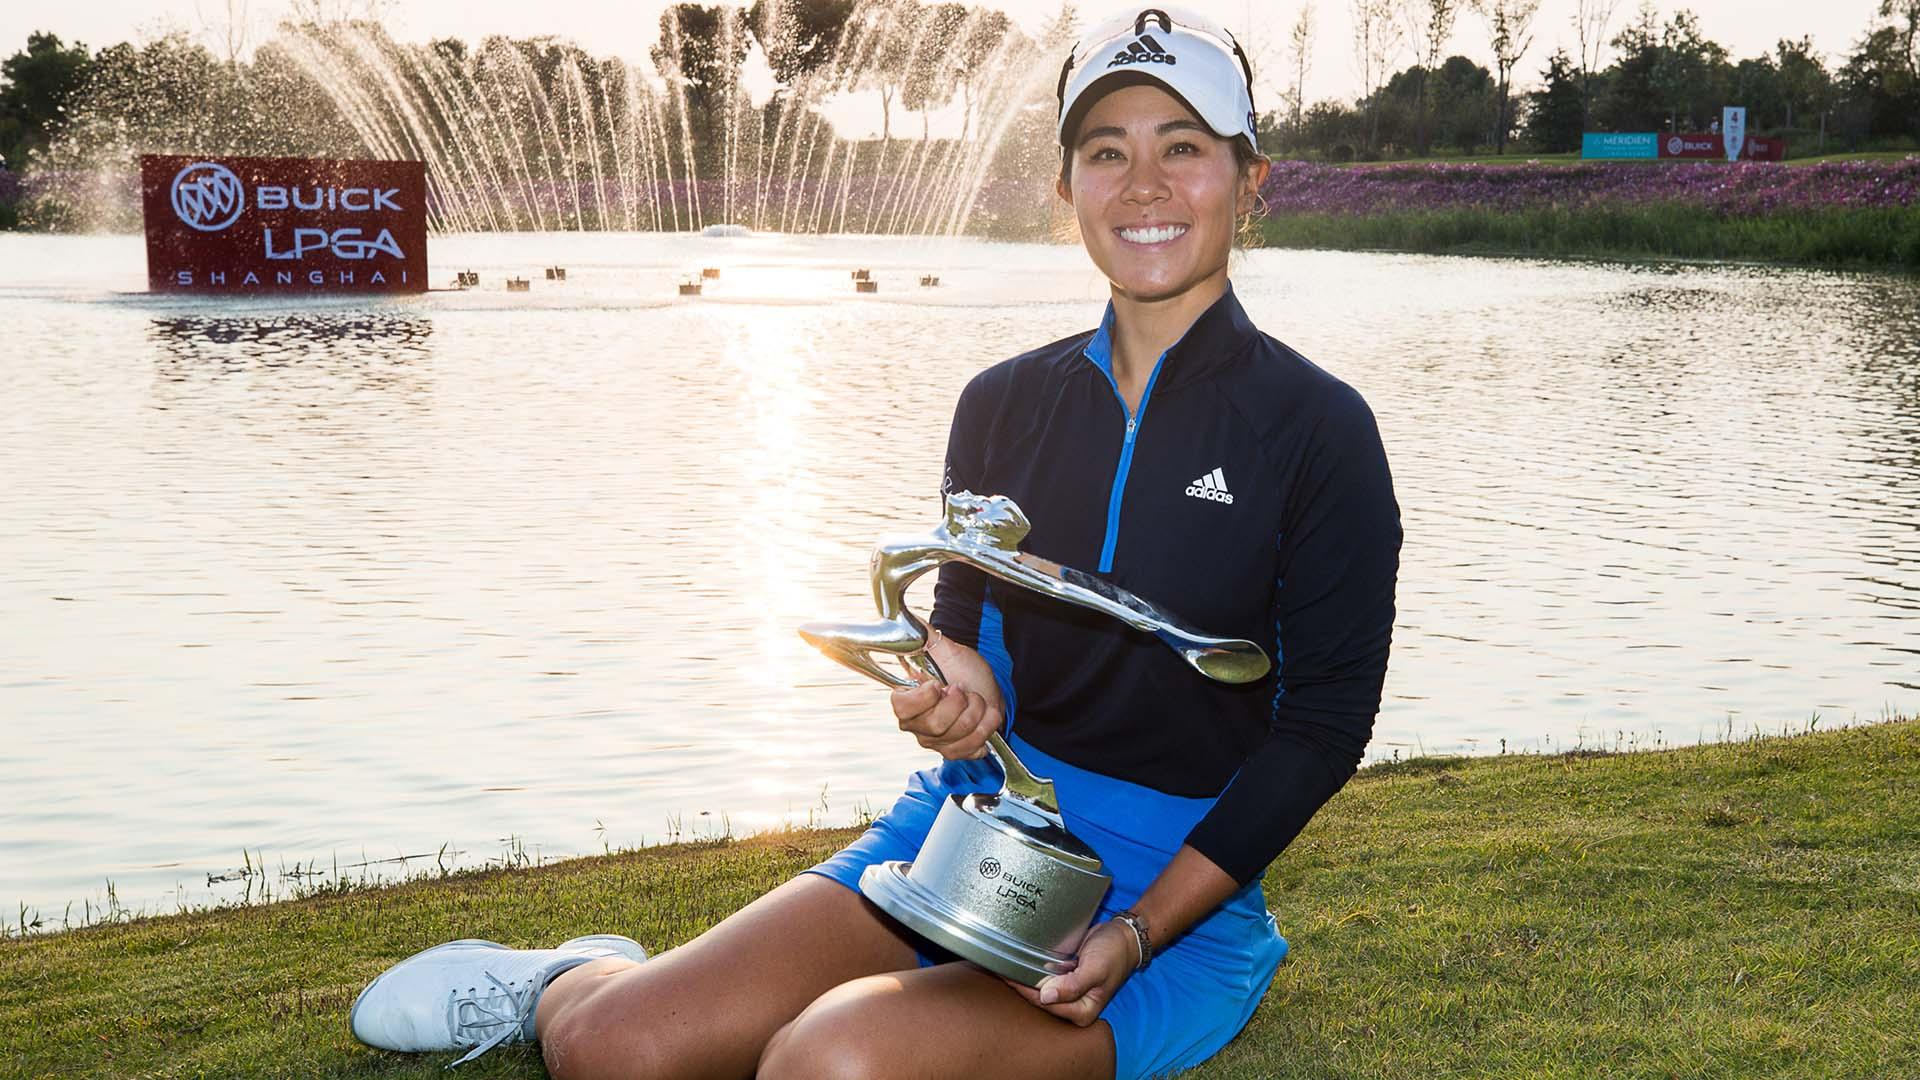 Buick LPGA Shanghai: Danielle Kang